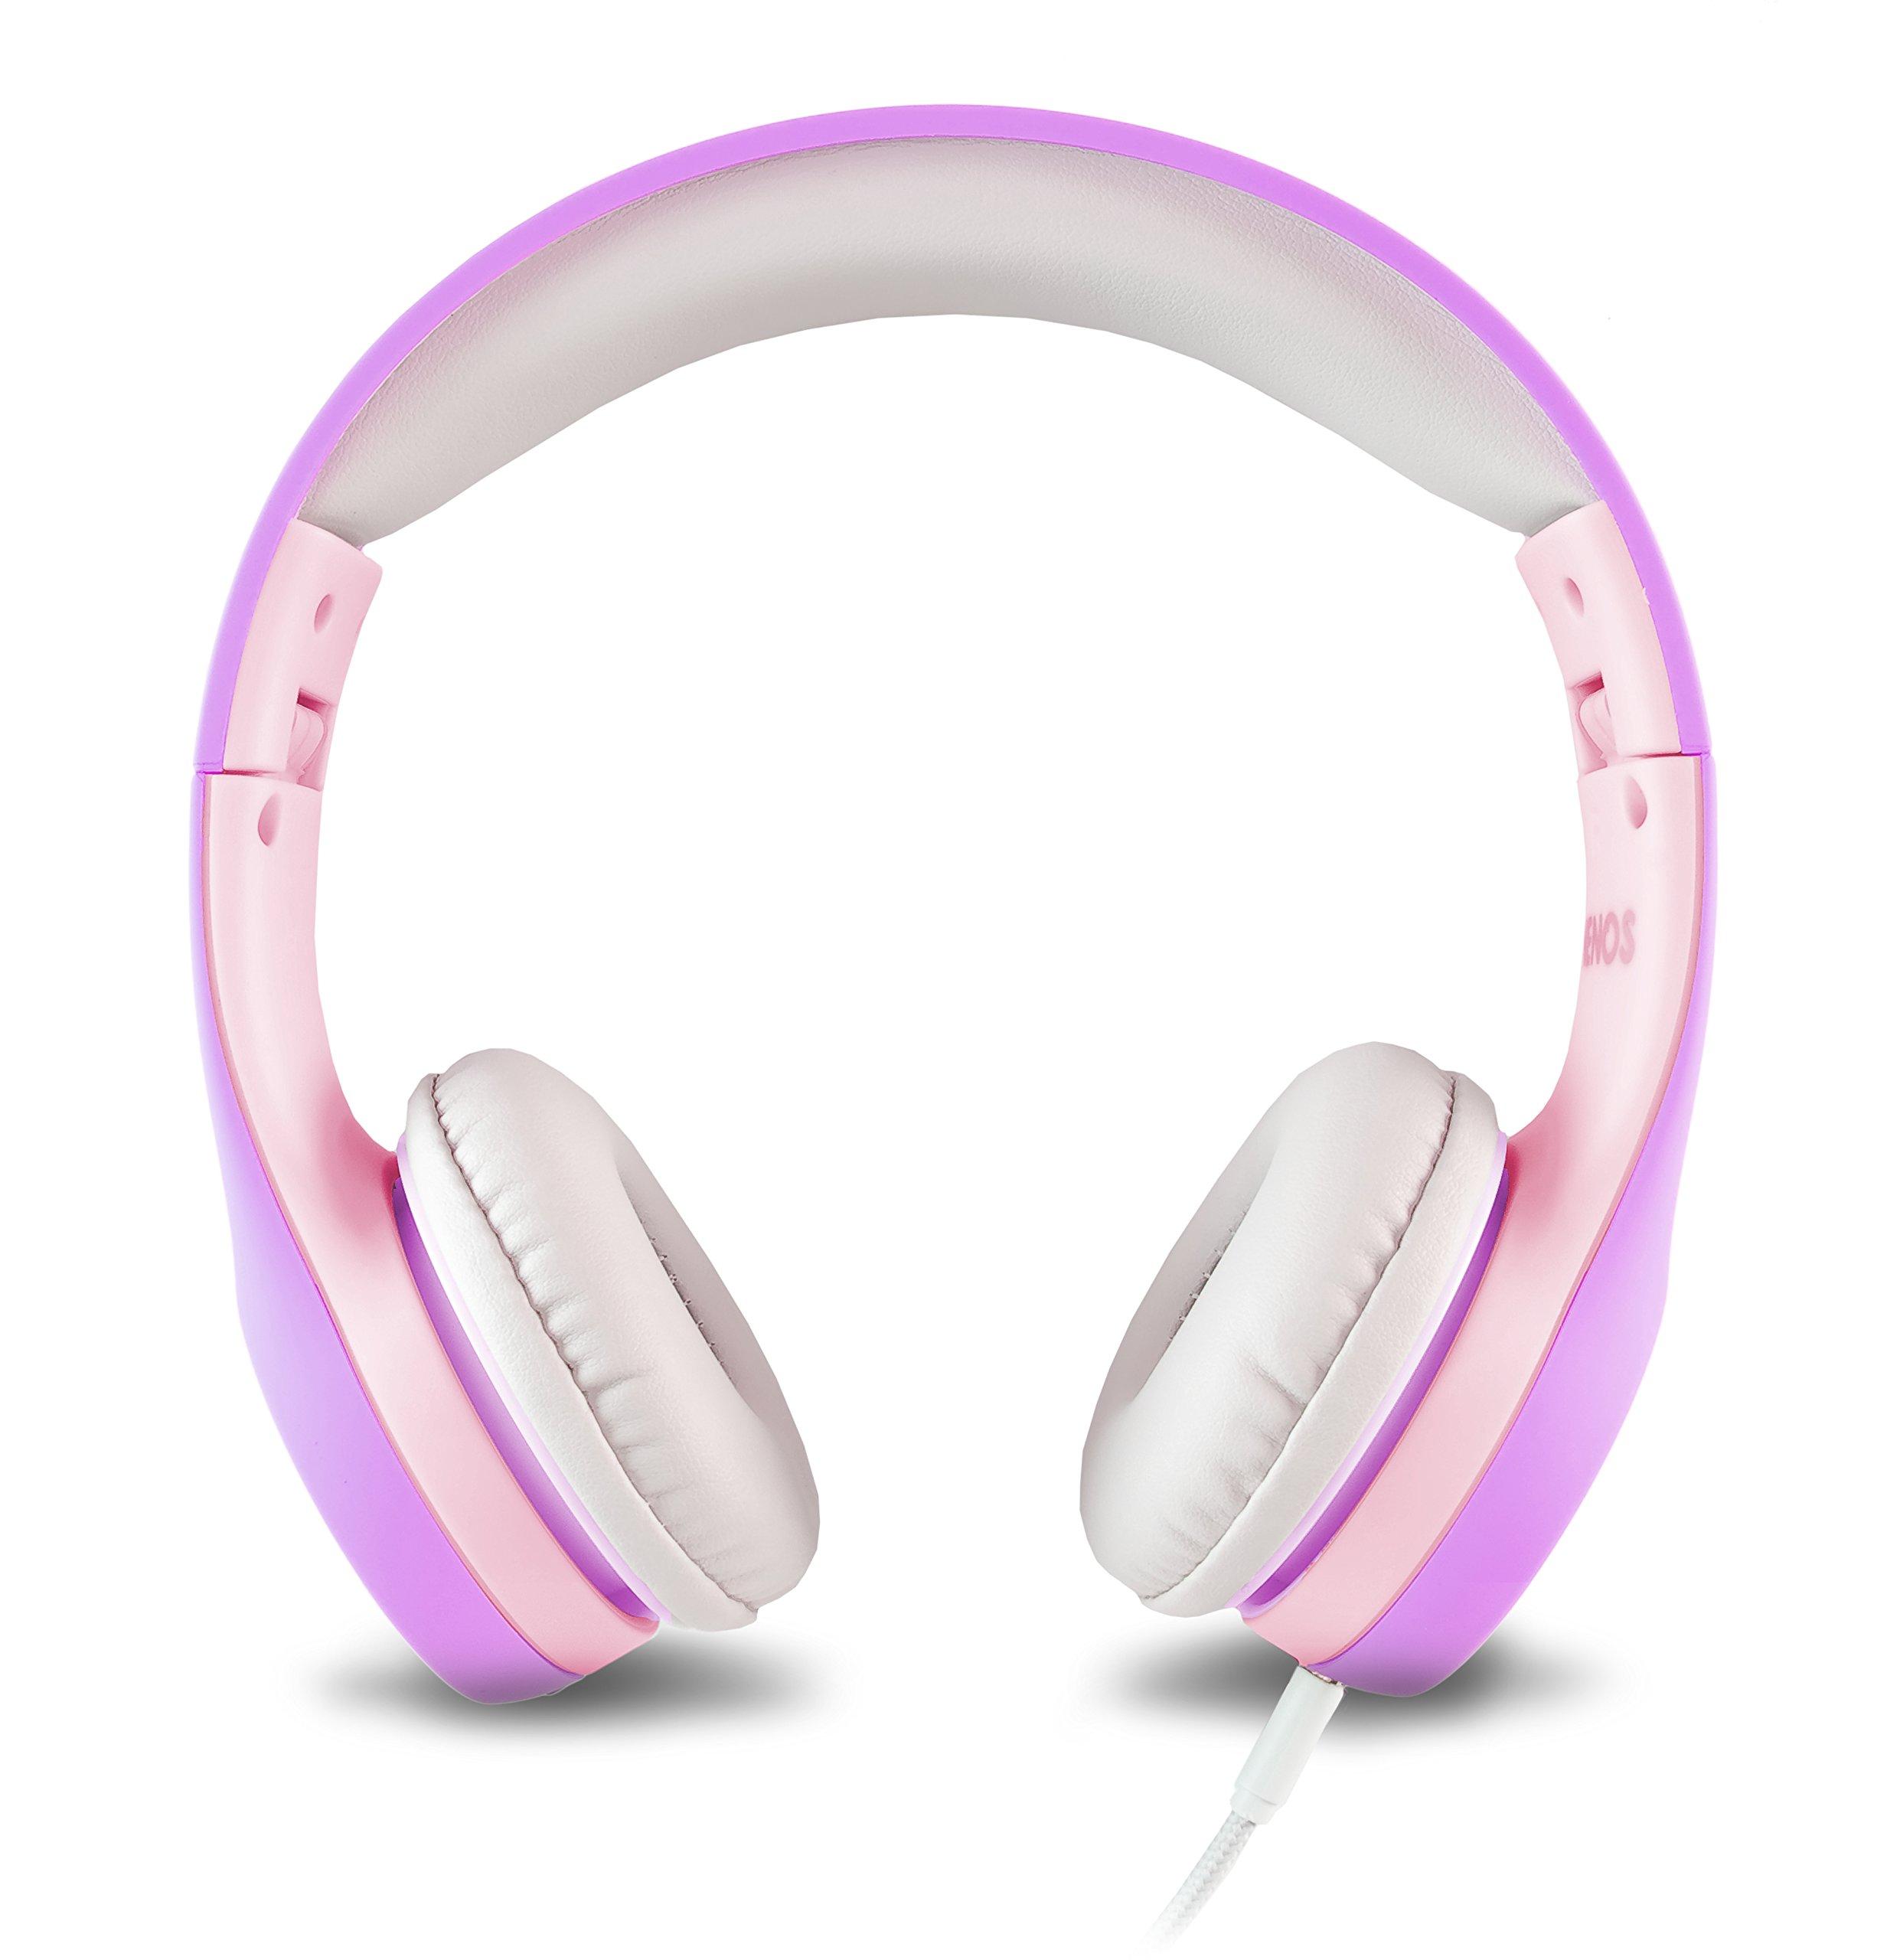 Nenos Children Headphones Kids Headphones Children's Headphones Over Ear Headphones Kids Computer Volume Limited Headphones for Kids Foldable (Lavender/Pink)